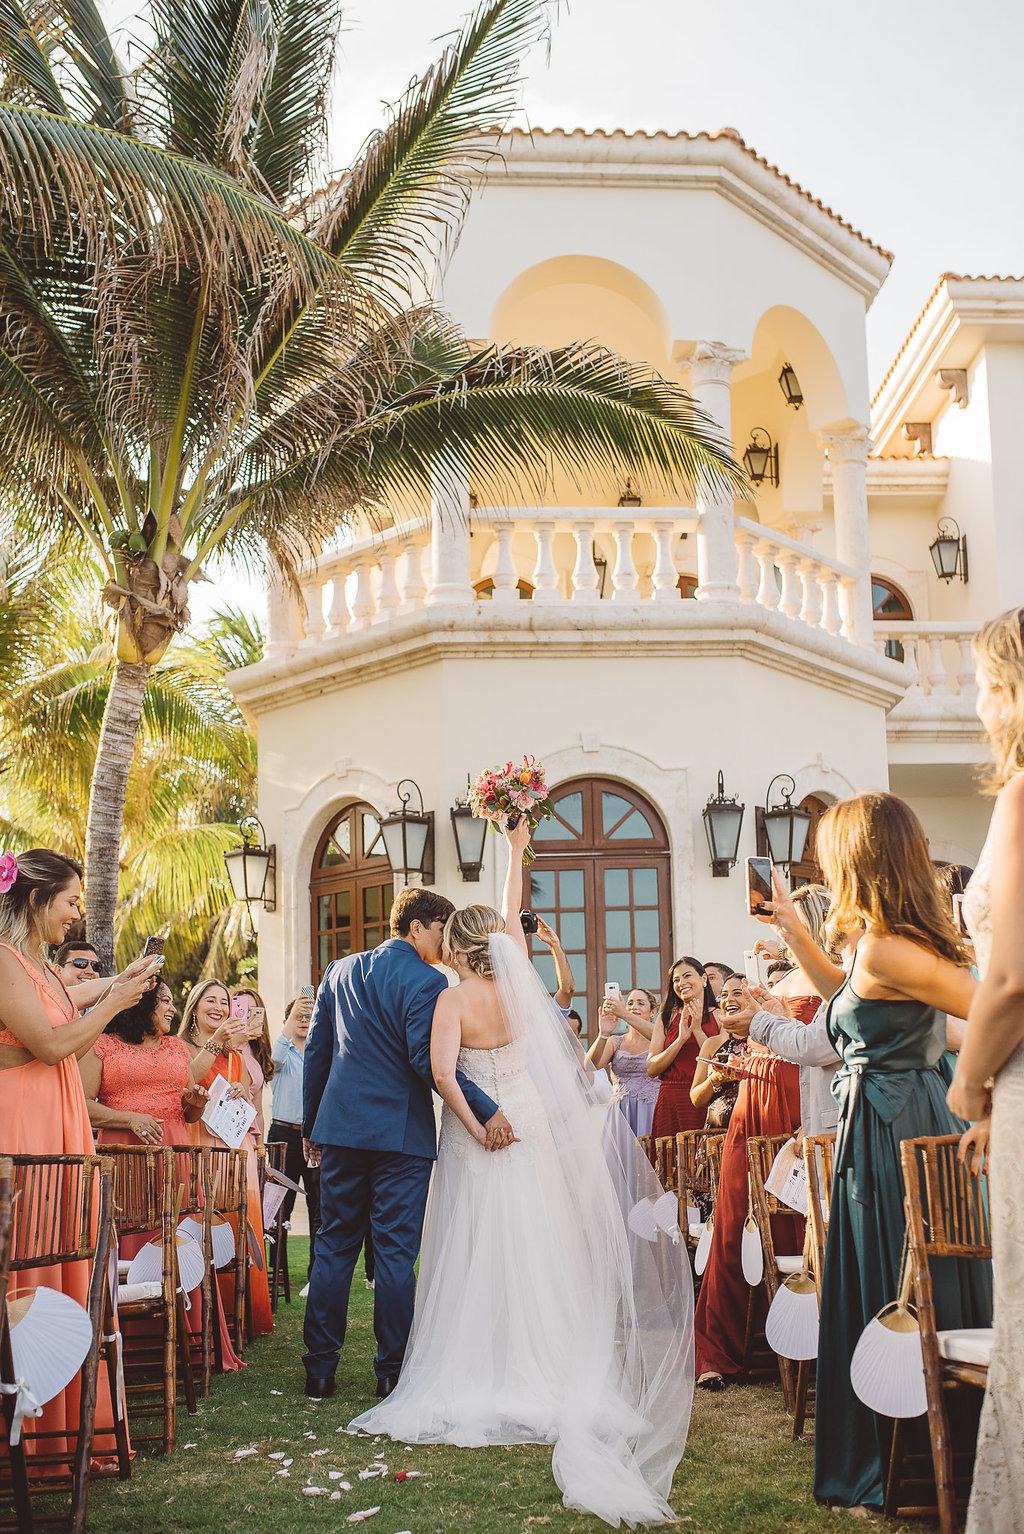 cancun-destination-wedding-mexico-villa-la-joya-29.jpg